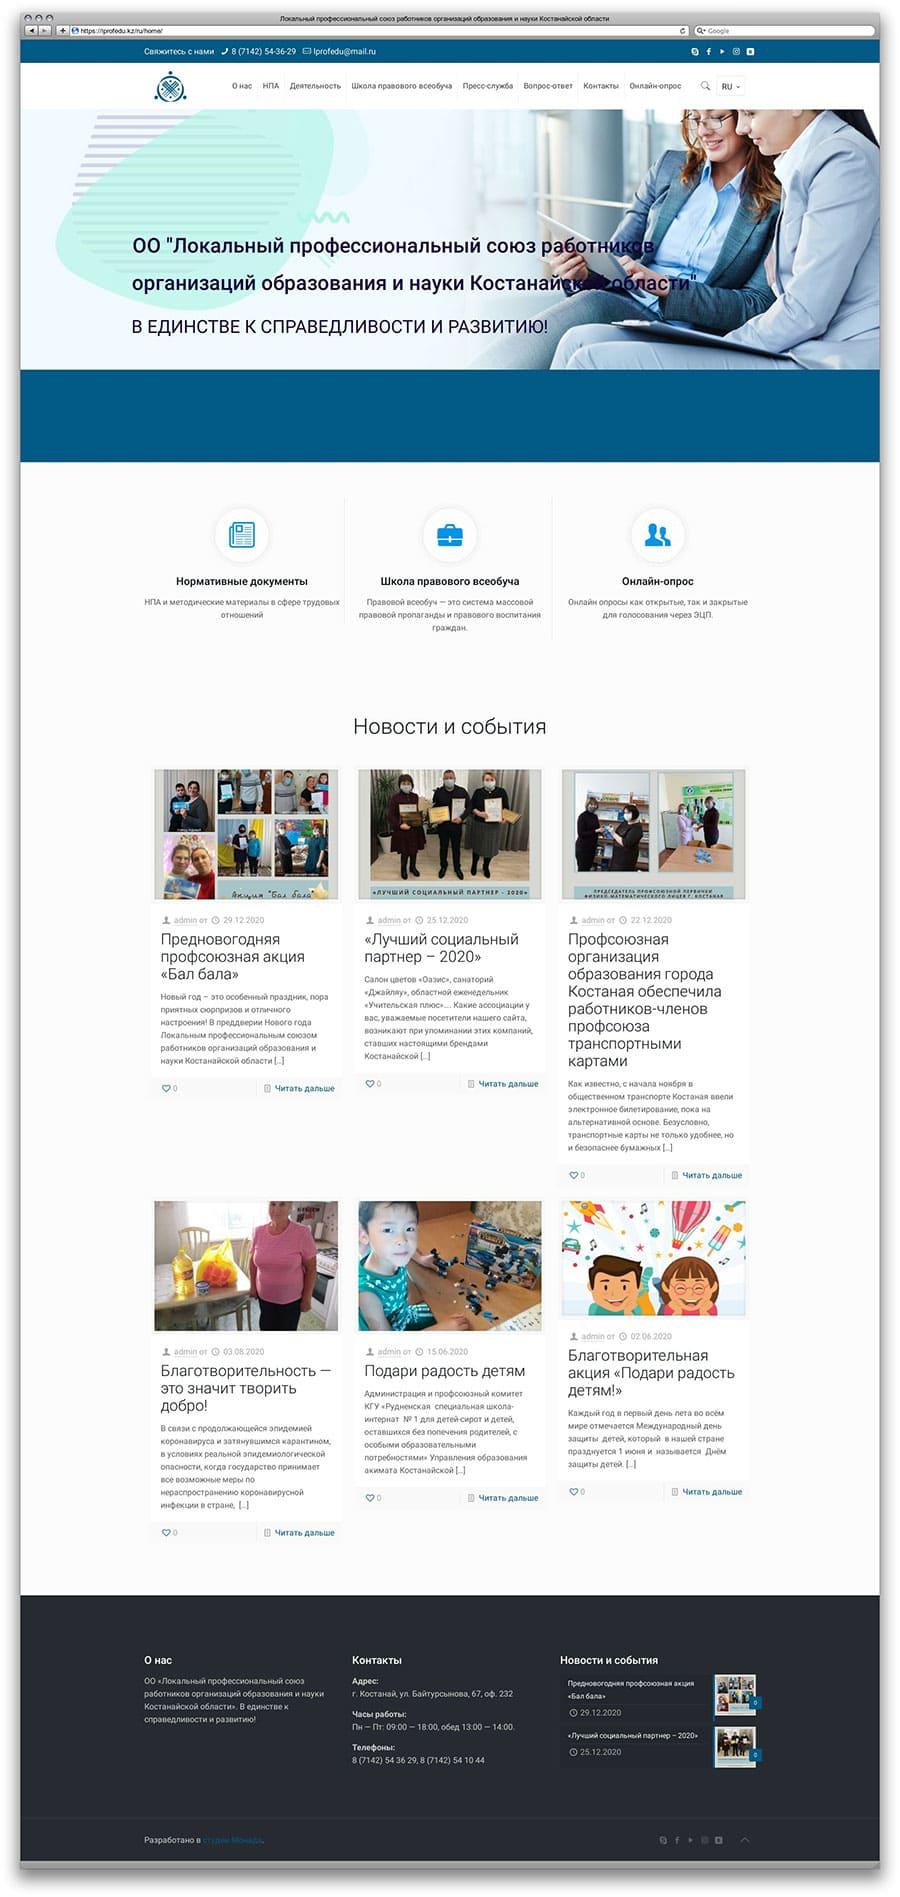 Создание сайта профсоюза в Костанае lprofedu.kz